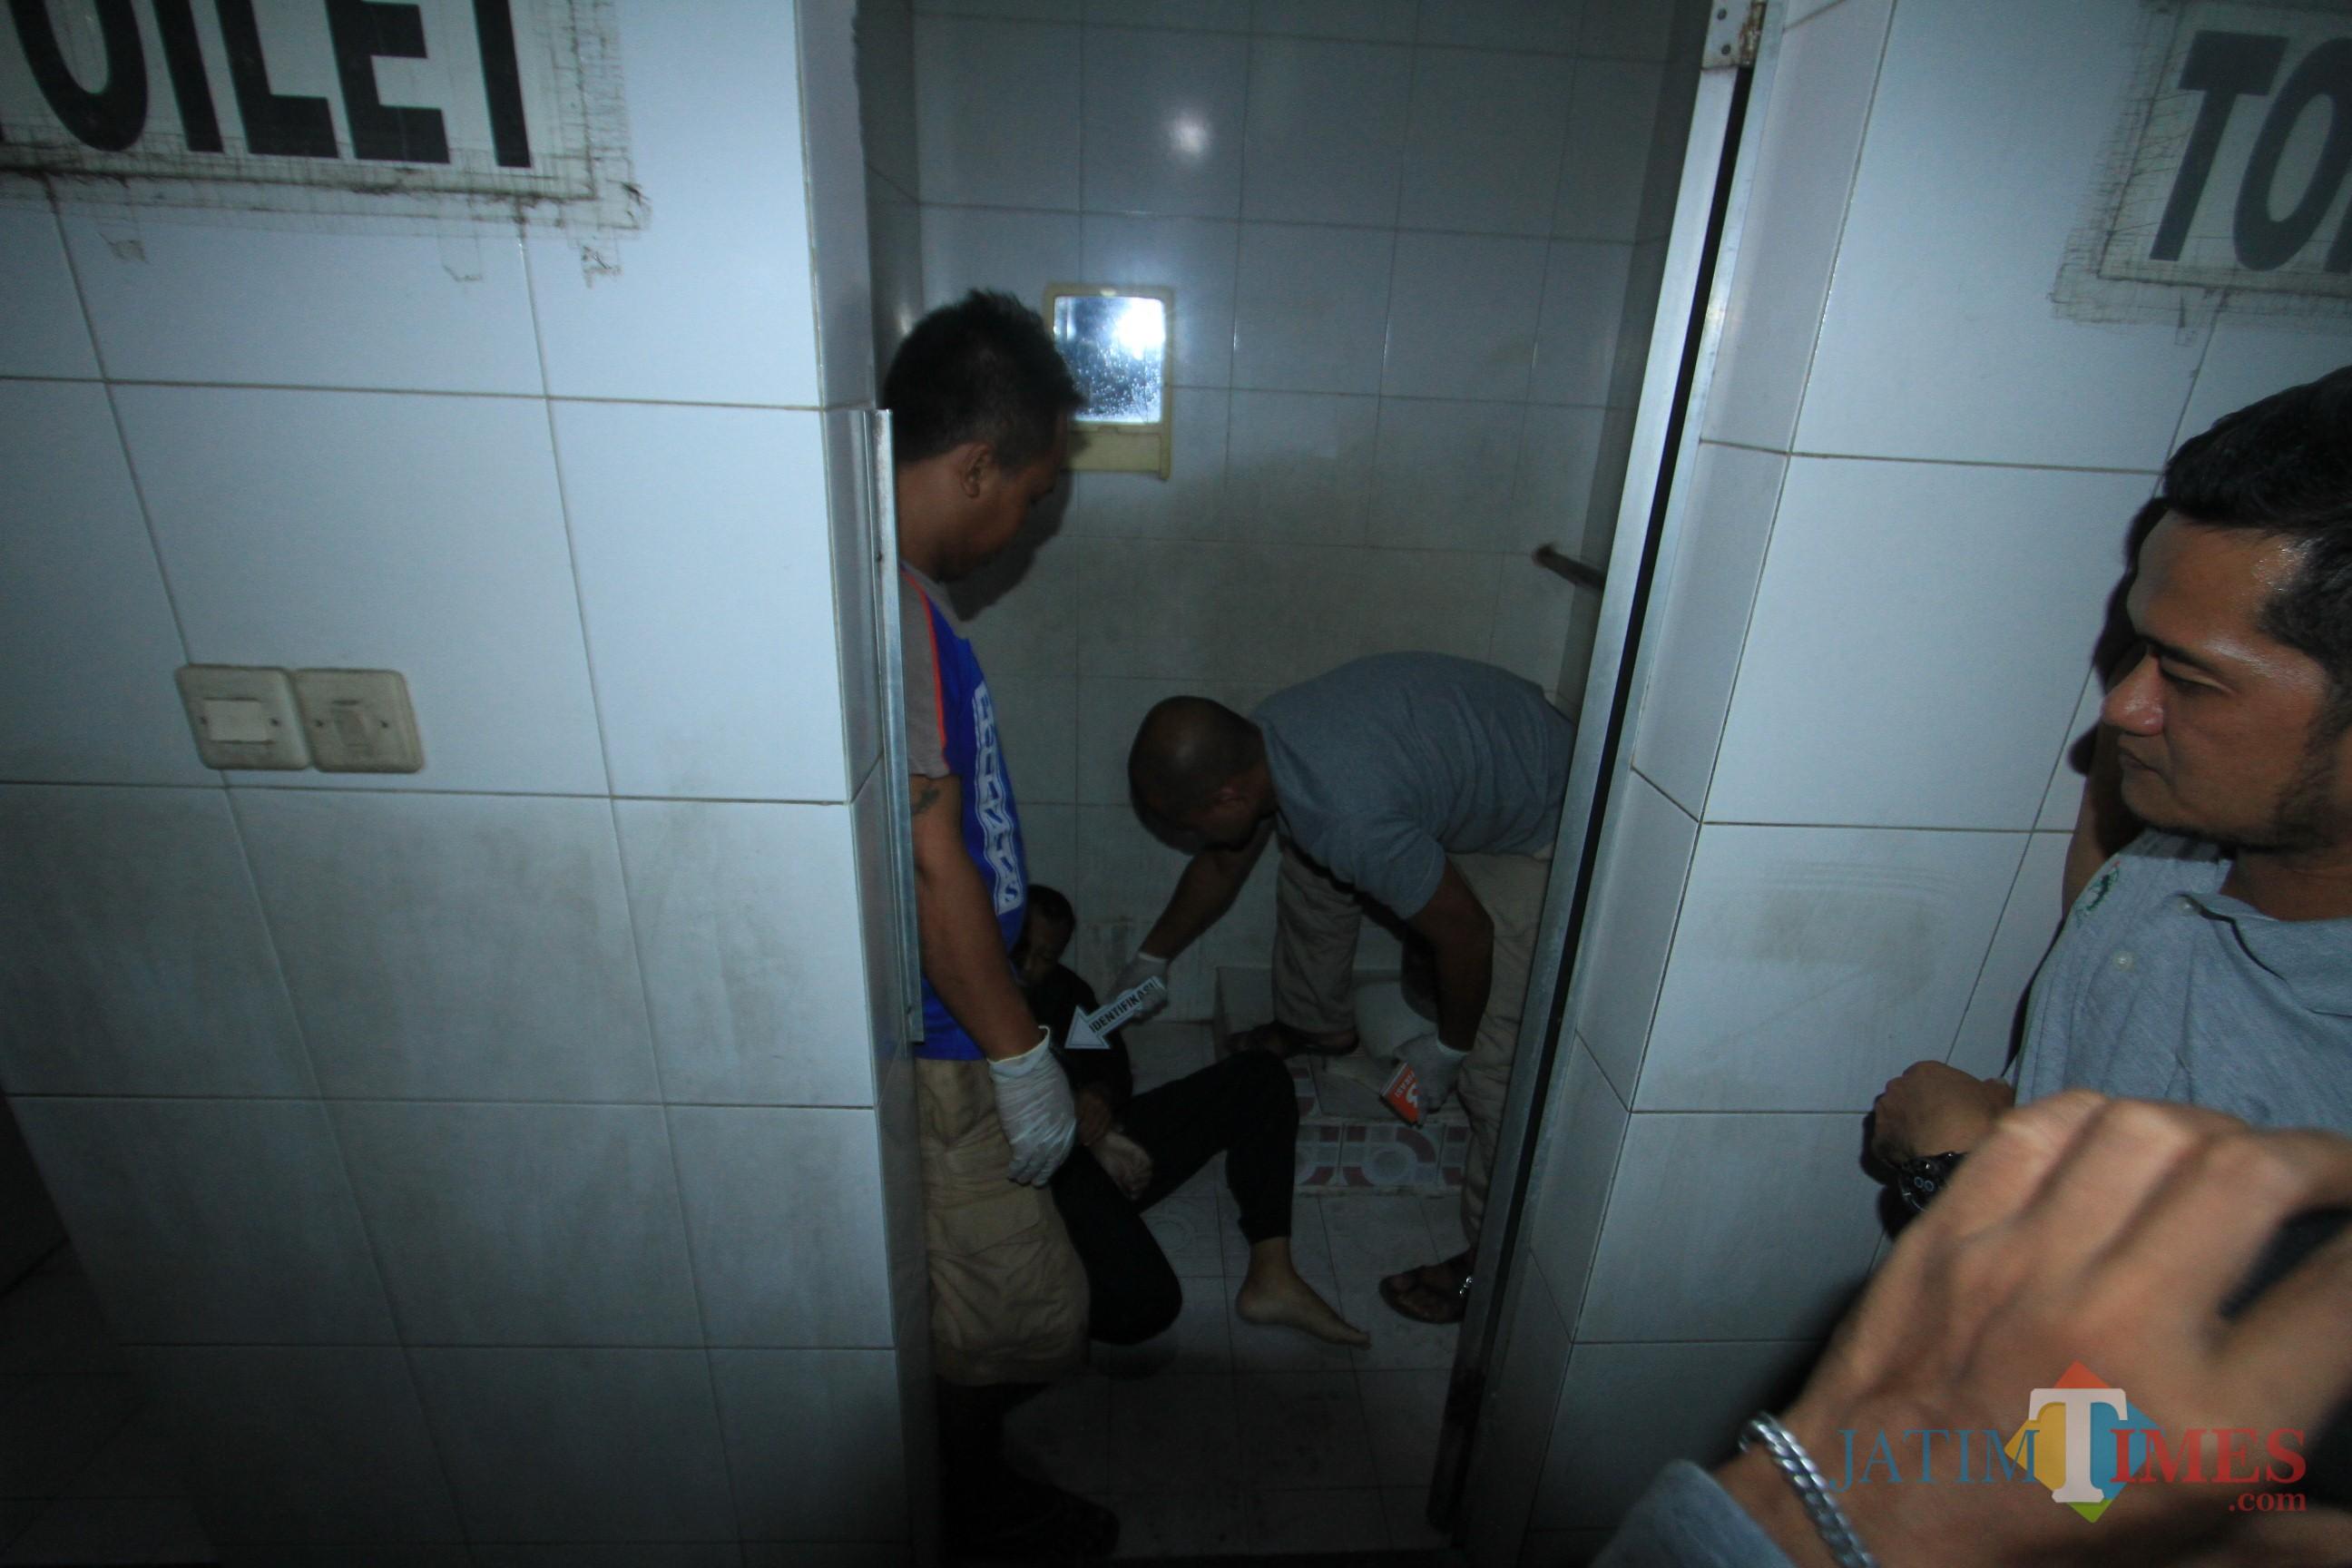 TYim identifikasi Polresta Probolinggo melakukan olah TKP sebelum  jasad dibawa ke RSUD dr Muhammad Saleh  (Agus Salam/Jatim TIMES)